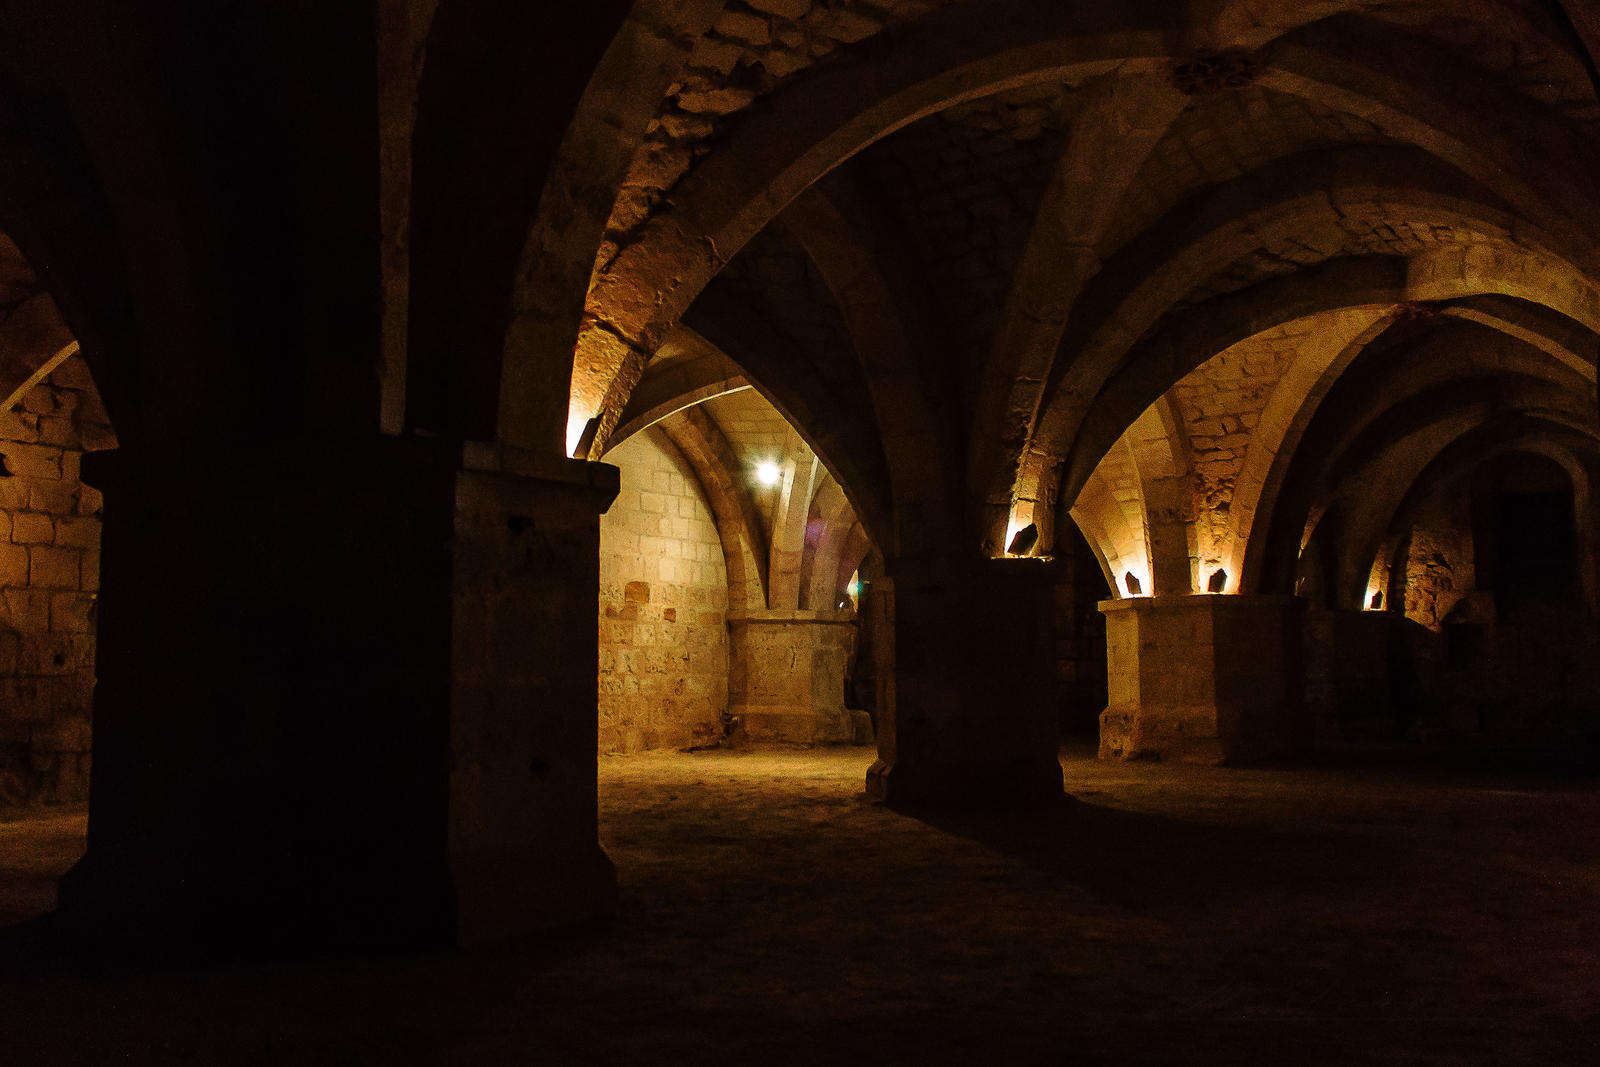 Cellar  Mortagne Au Perche Orne France by hubert61